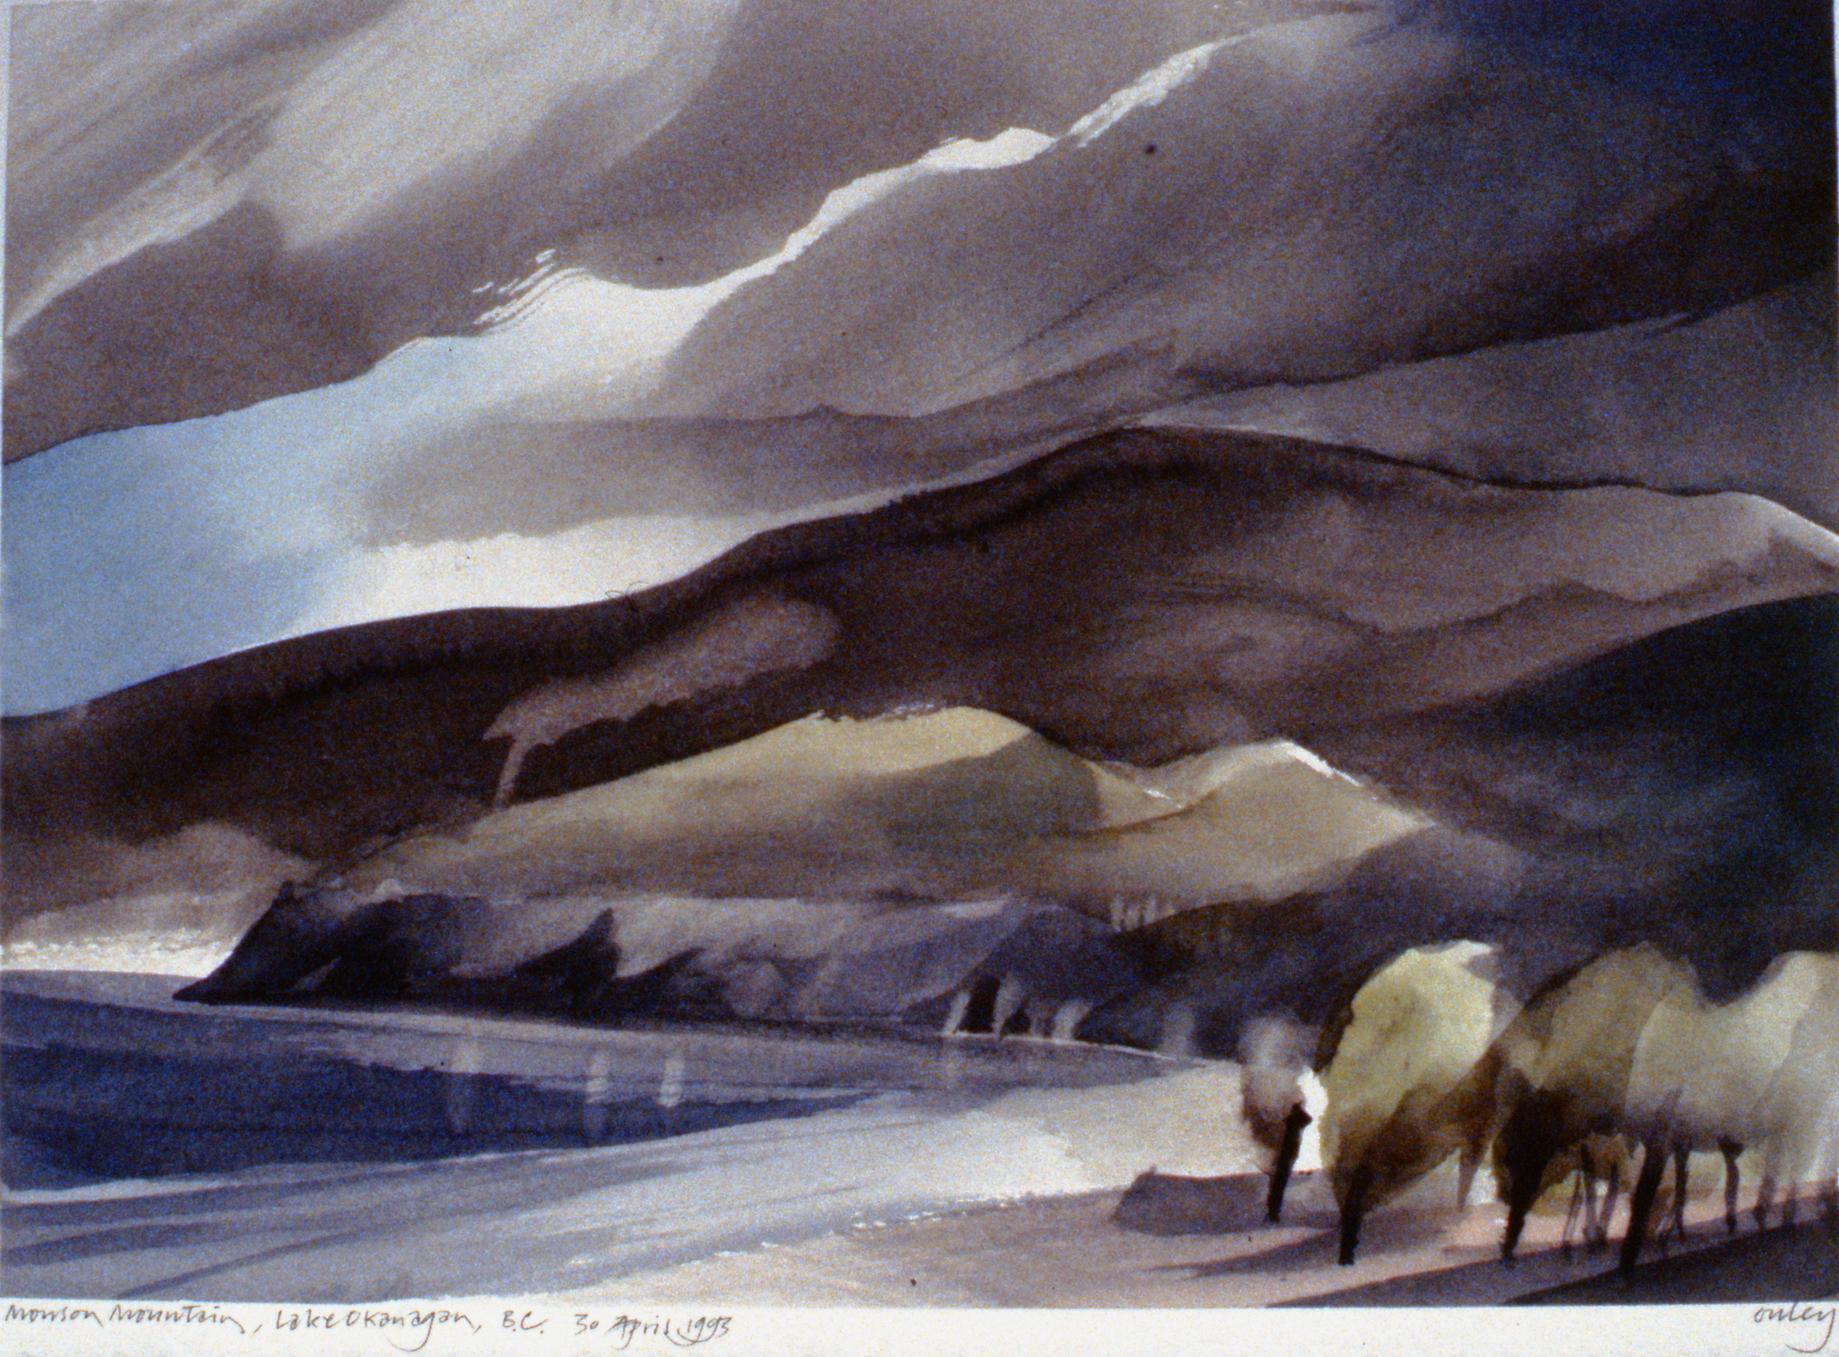 Munson Mountain, Lake Okanagan , April 30th, 1993, Toni Onley, watercolour on paper, 27.2 x 37.7 cm, 1994.15.11. Gift of the artist.